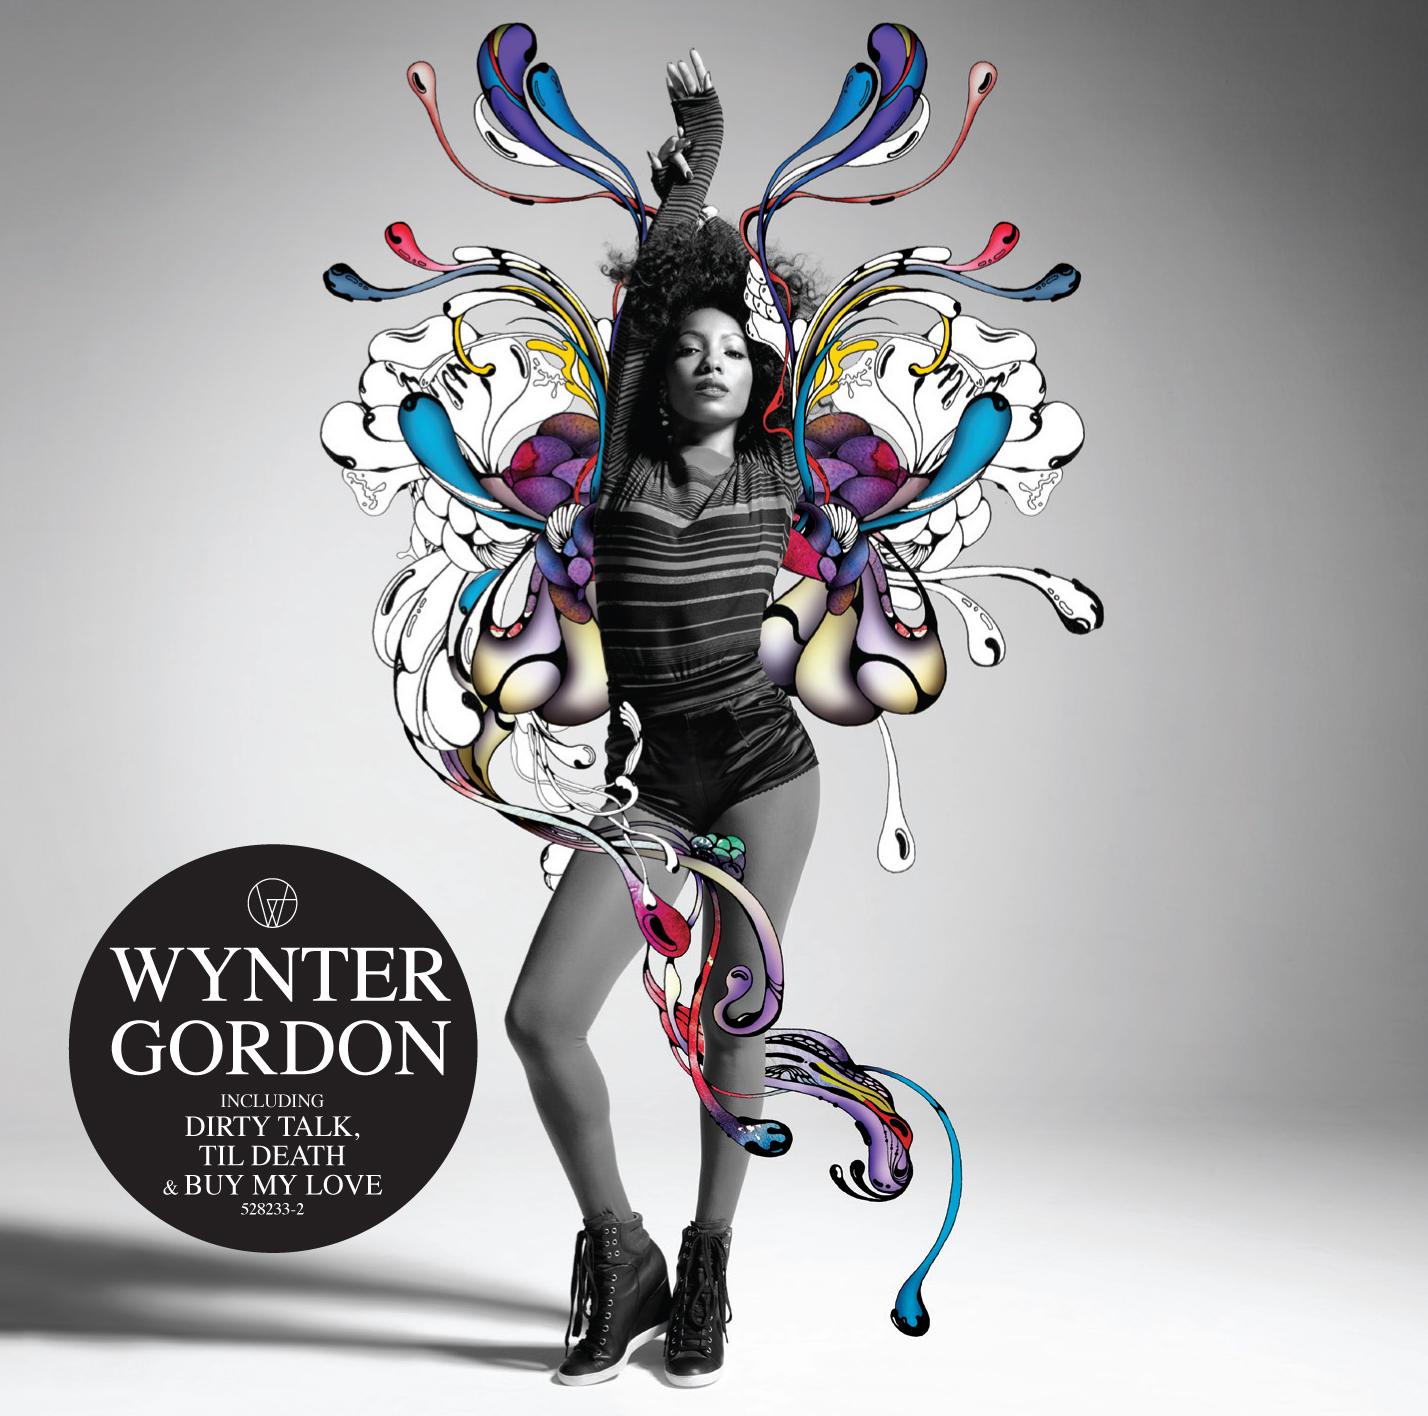 http://1.bp.blogspot.com/-S3euLPTXRnM/Td0wpzRNUiI/AAAAAAAAAmU/0yVFS_A2_6A/s1600/Wynter-Gordon-With-The-Music-I-Die.jpg